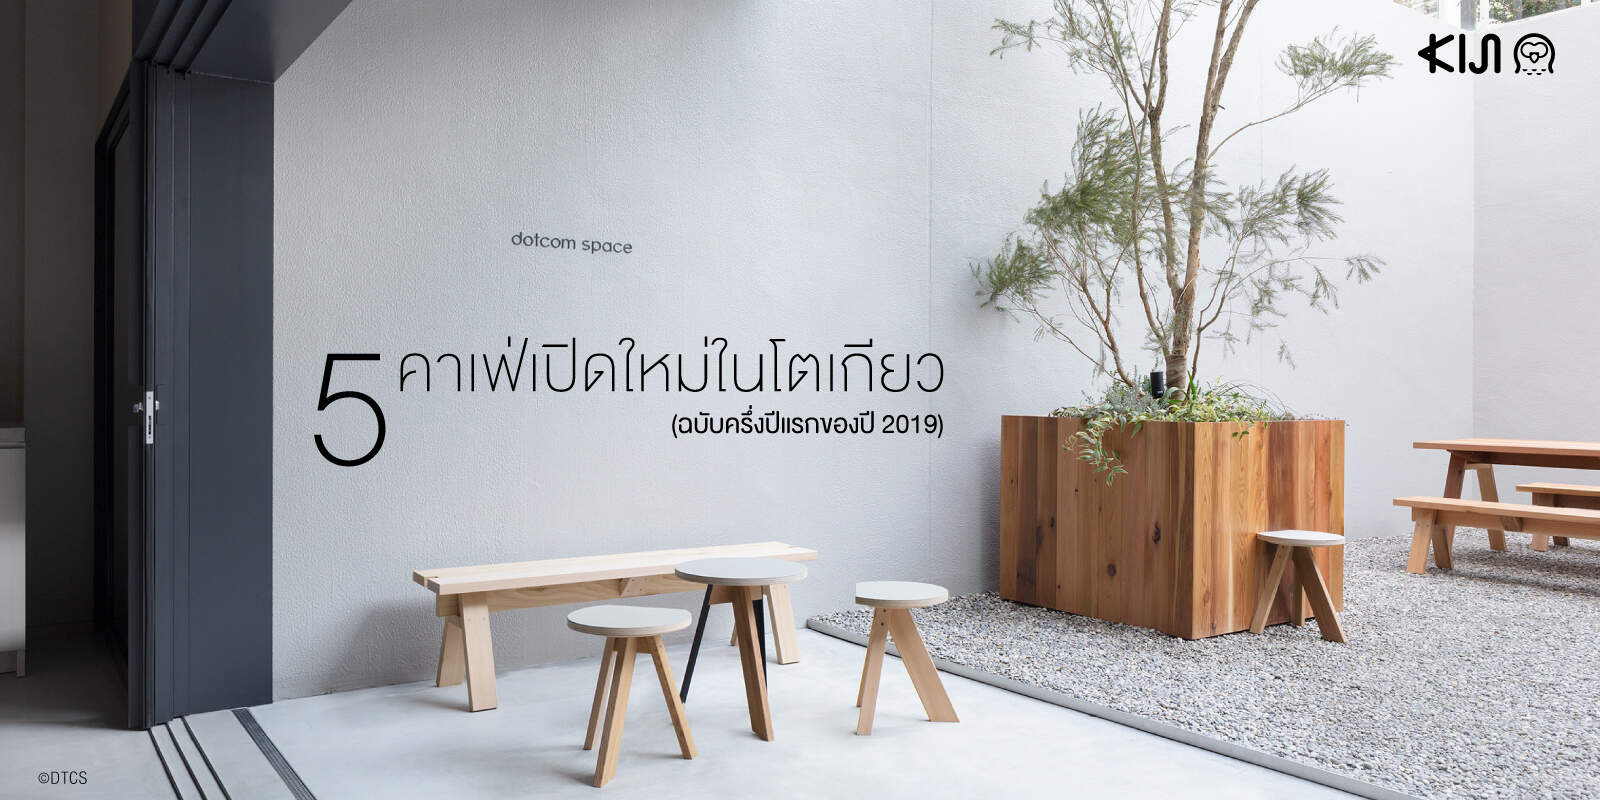 Tokyo cafe half year 2019